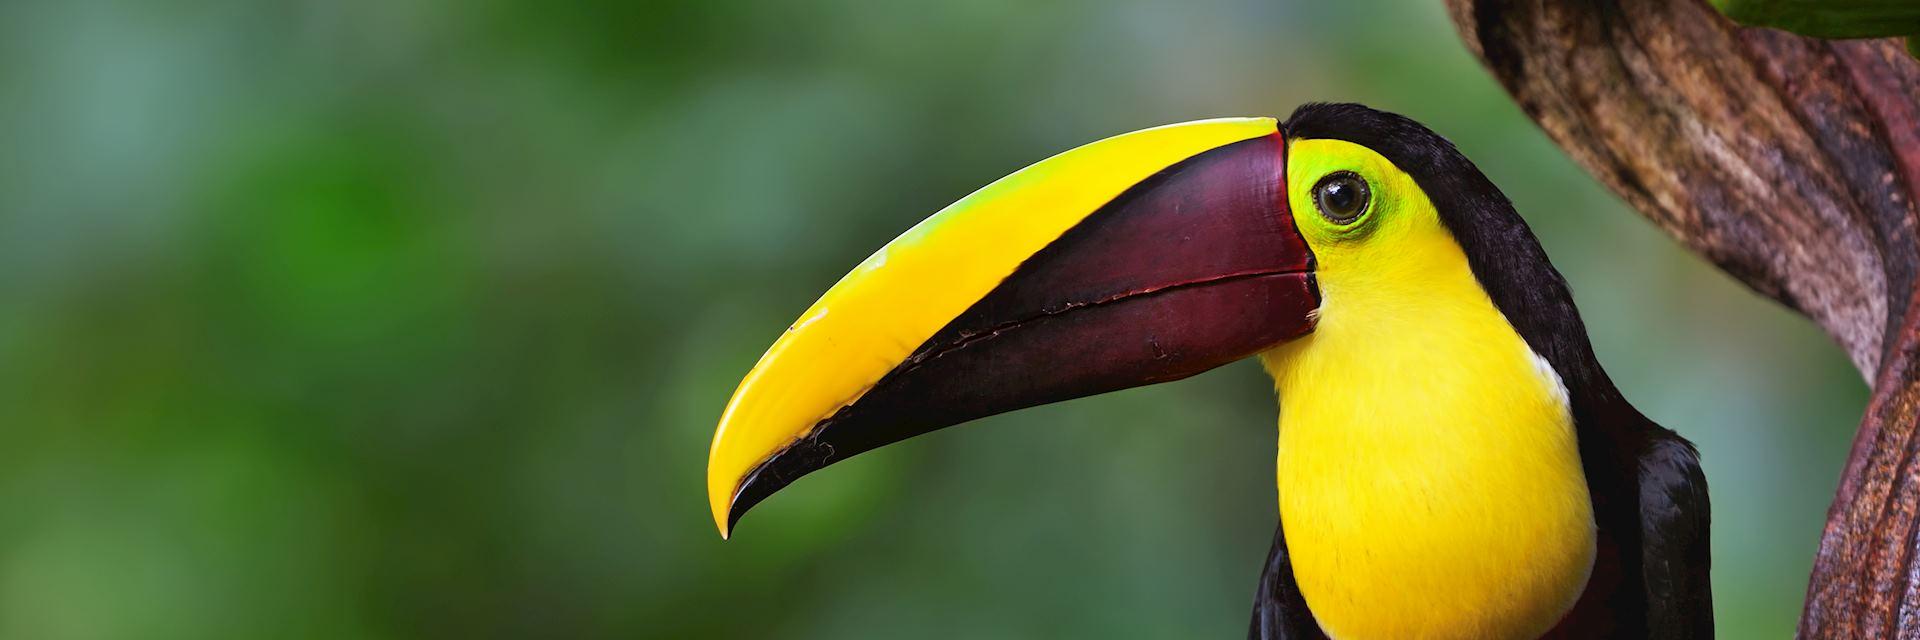 Chestnut-mandibled toucan in Costa Rica